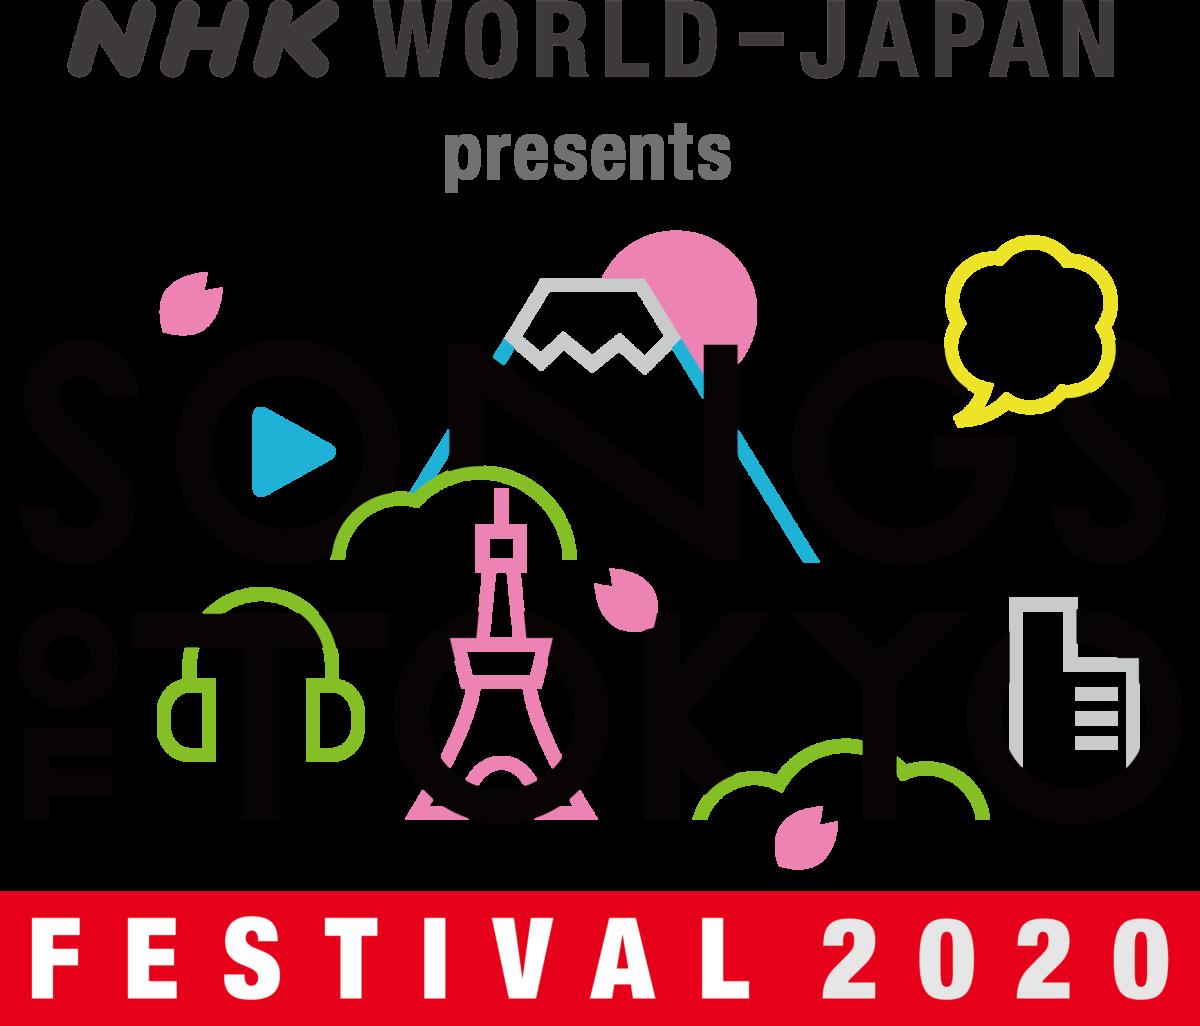 『NHK WORLD JAPAN presents SONGS OF TOKYO Festival 2020』